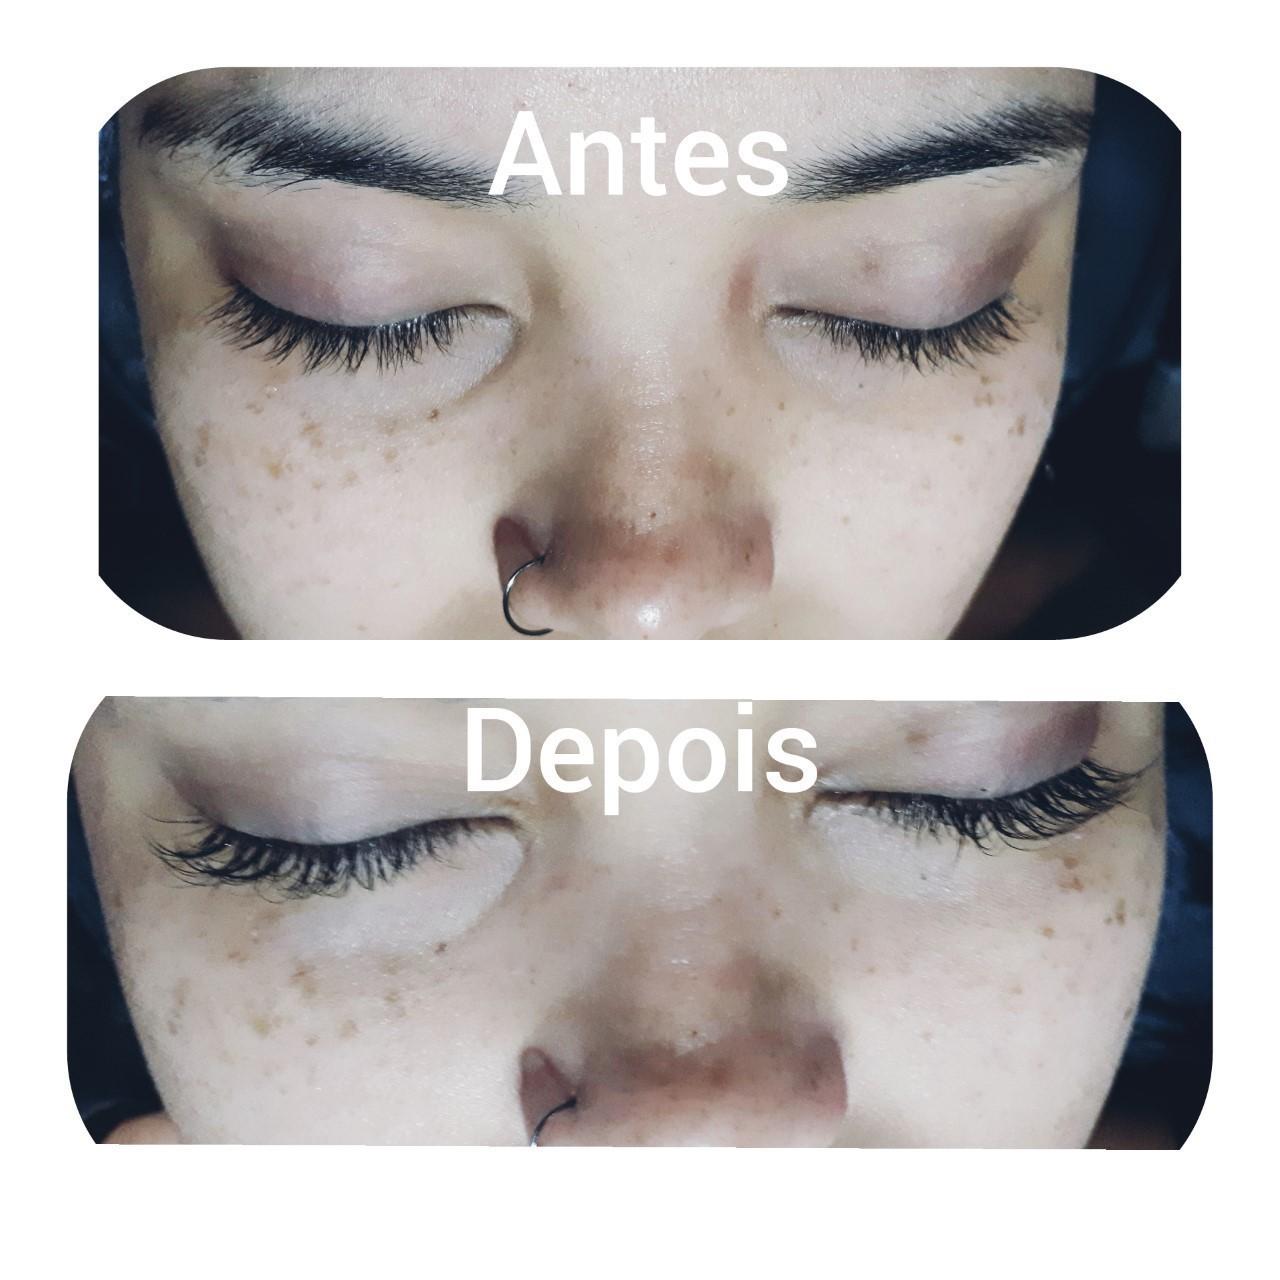 #alongamentofioafio #embelezamentodoolhar estética esteticista estudante (esteticista) designer de sobrancelhas massoterapeuta